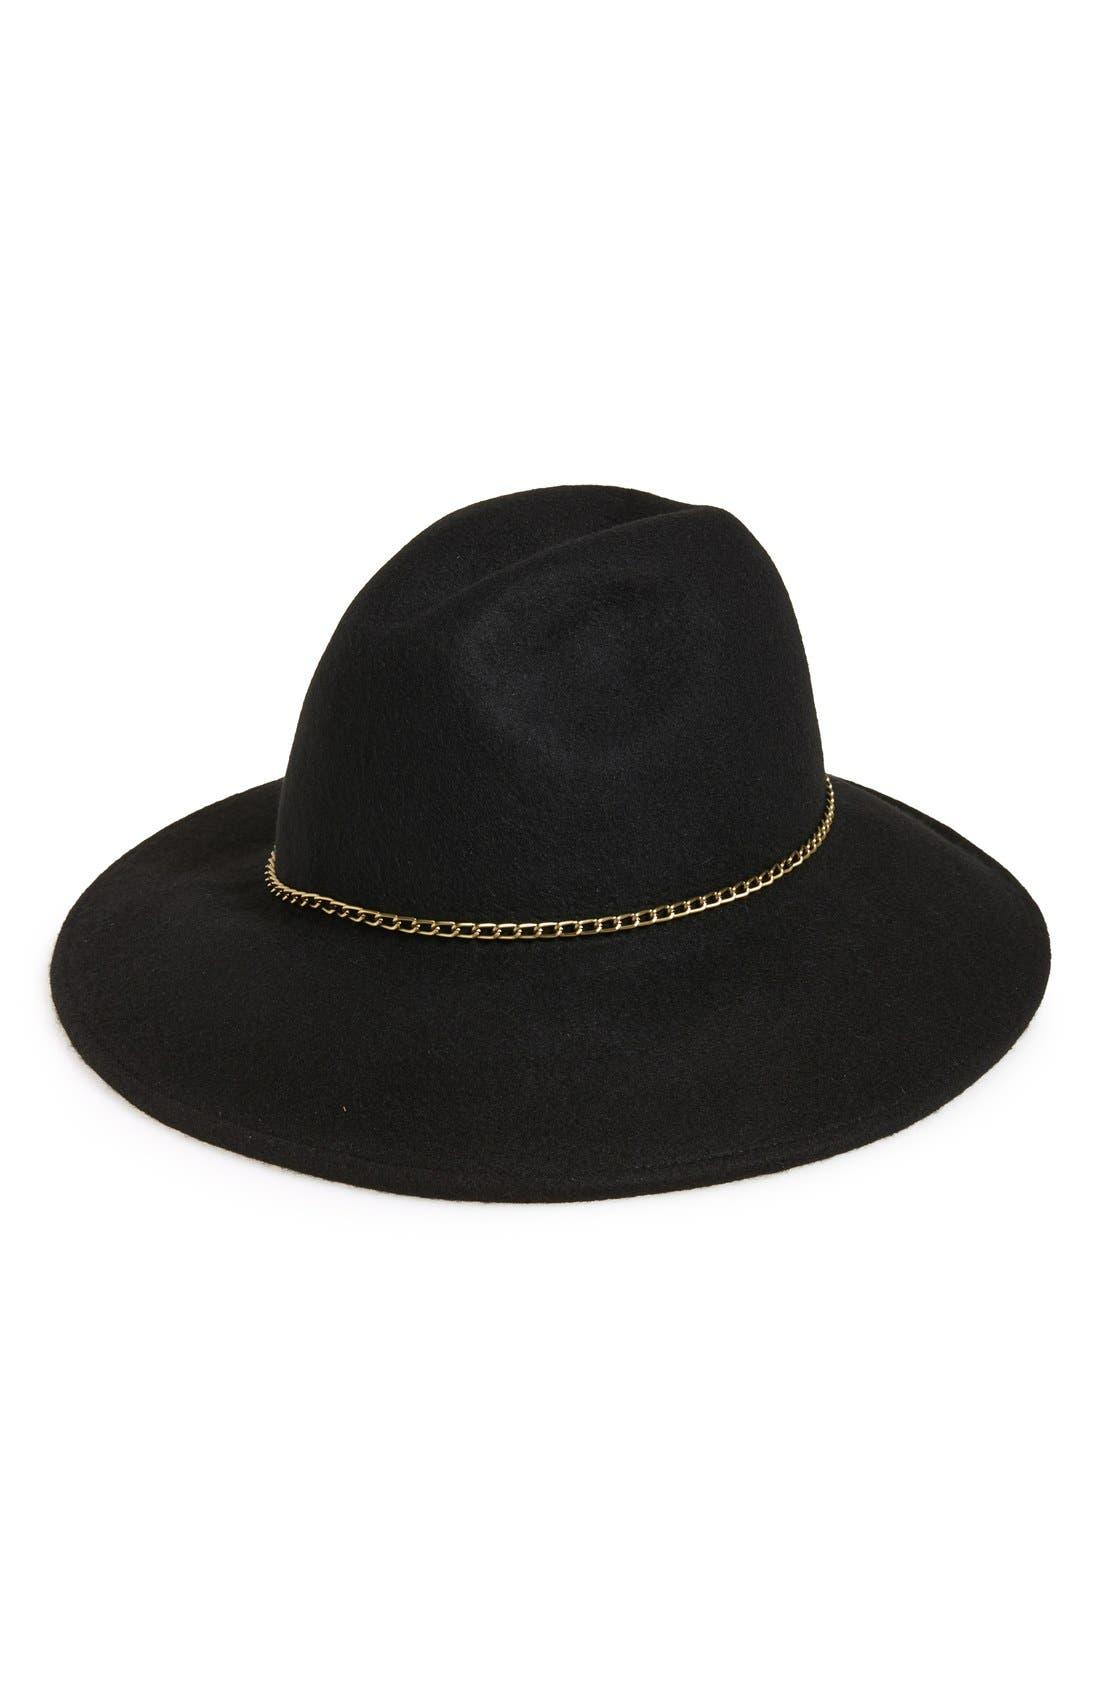 Chain Trim Panama Hat,                         Main,                         color, 001